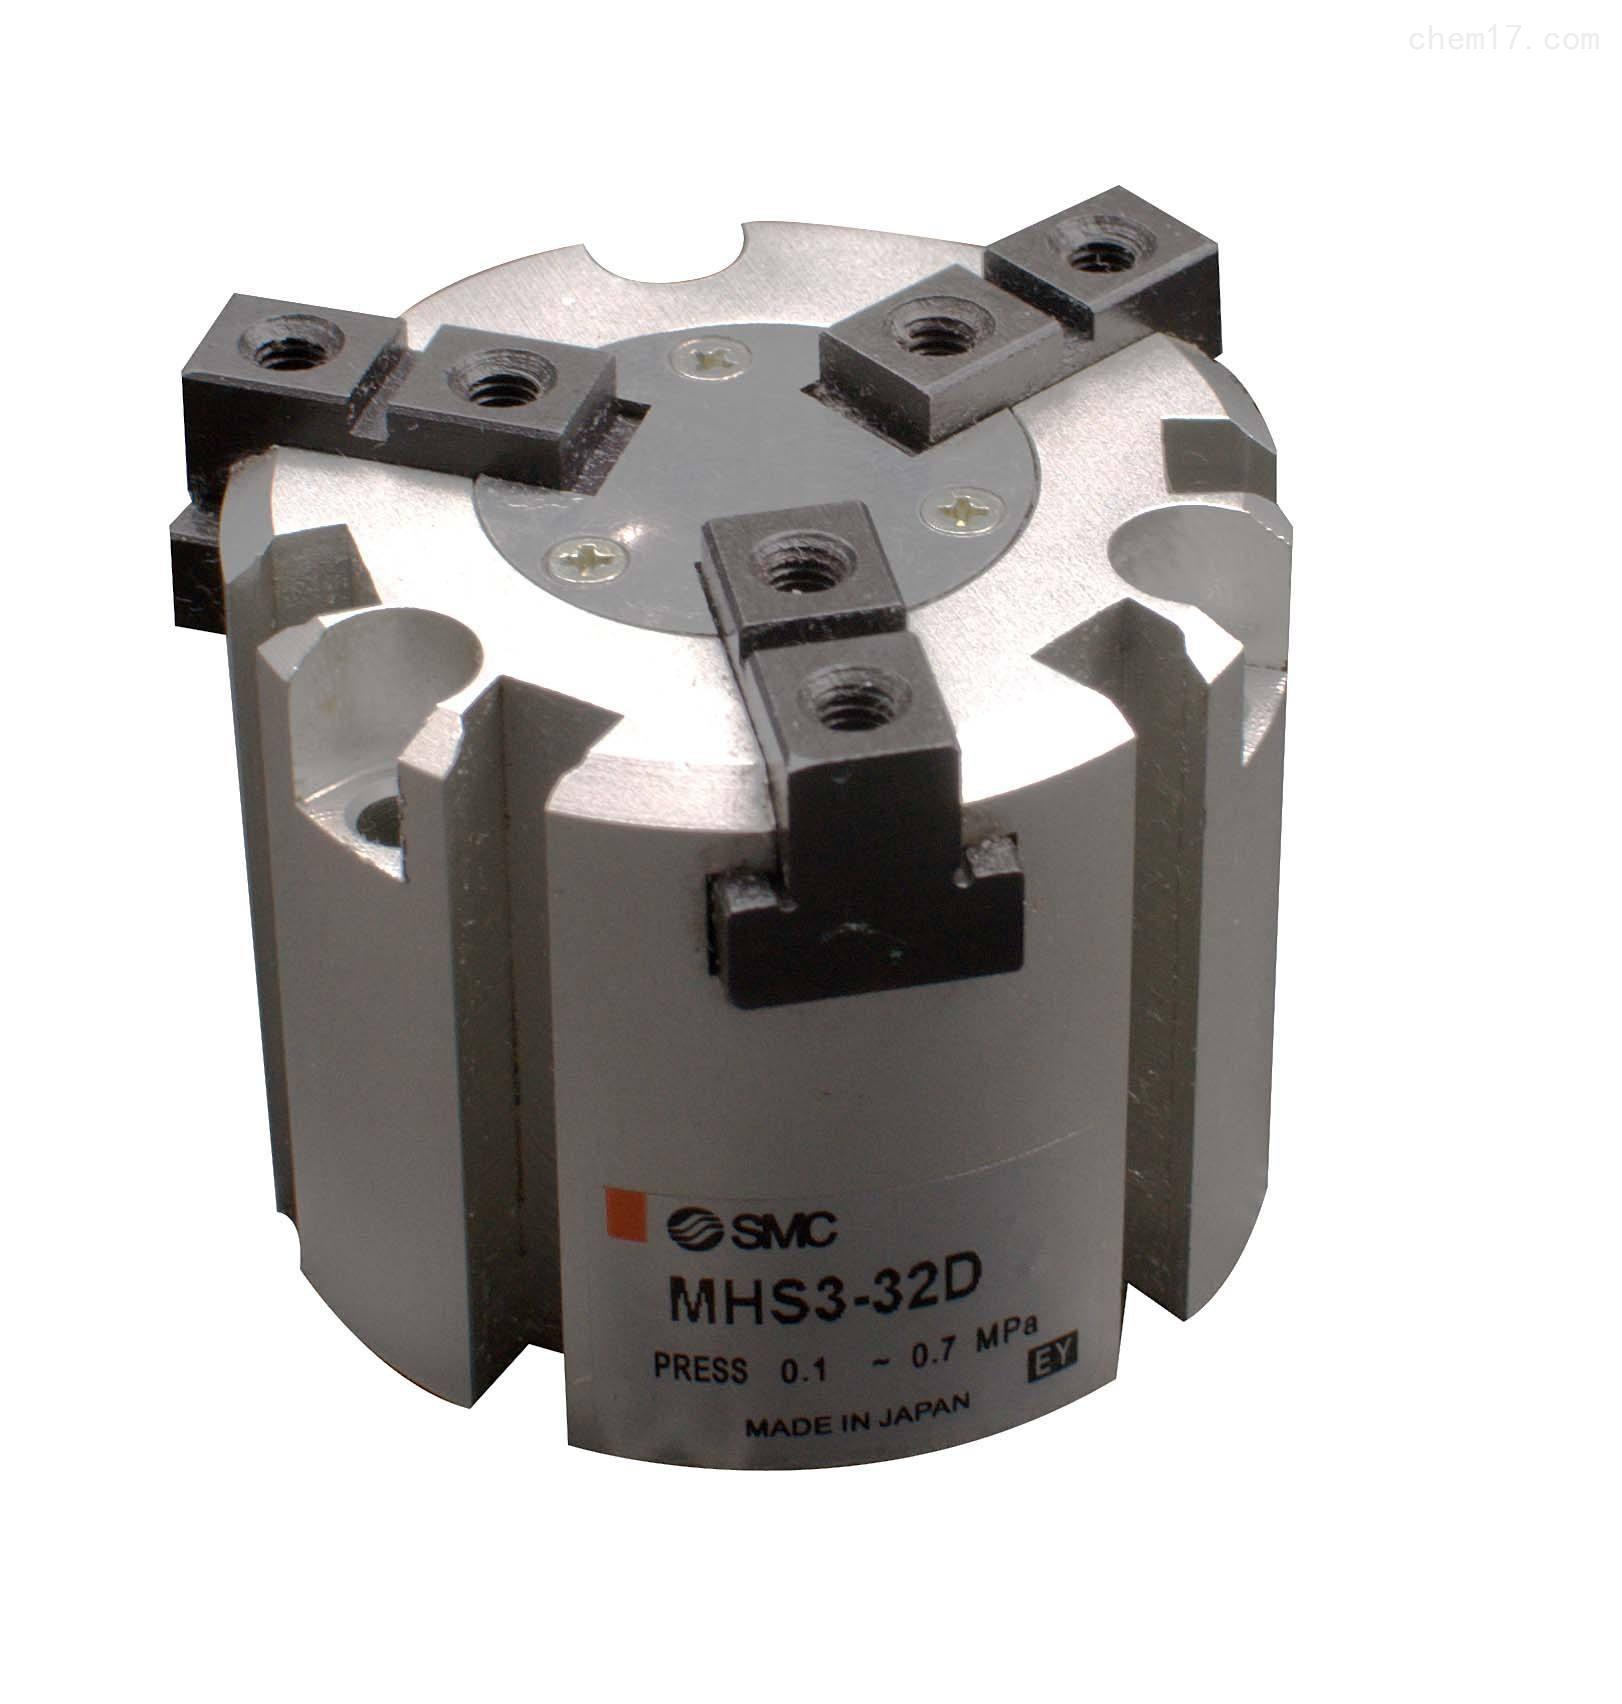 SMC圆柱体气爪MHS3-32D型号气缸到货了